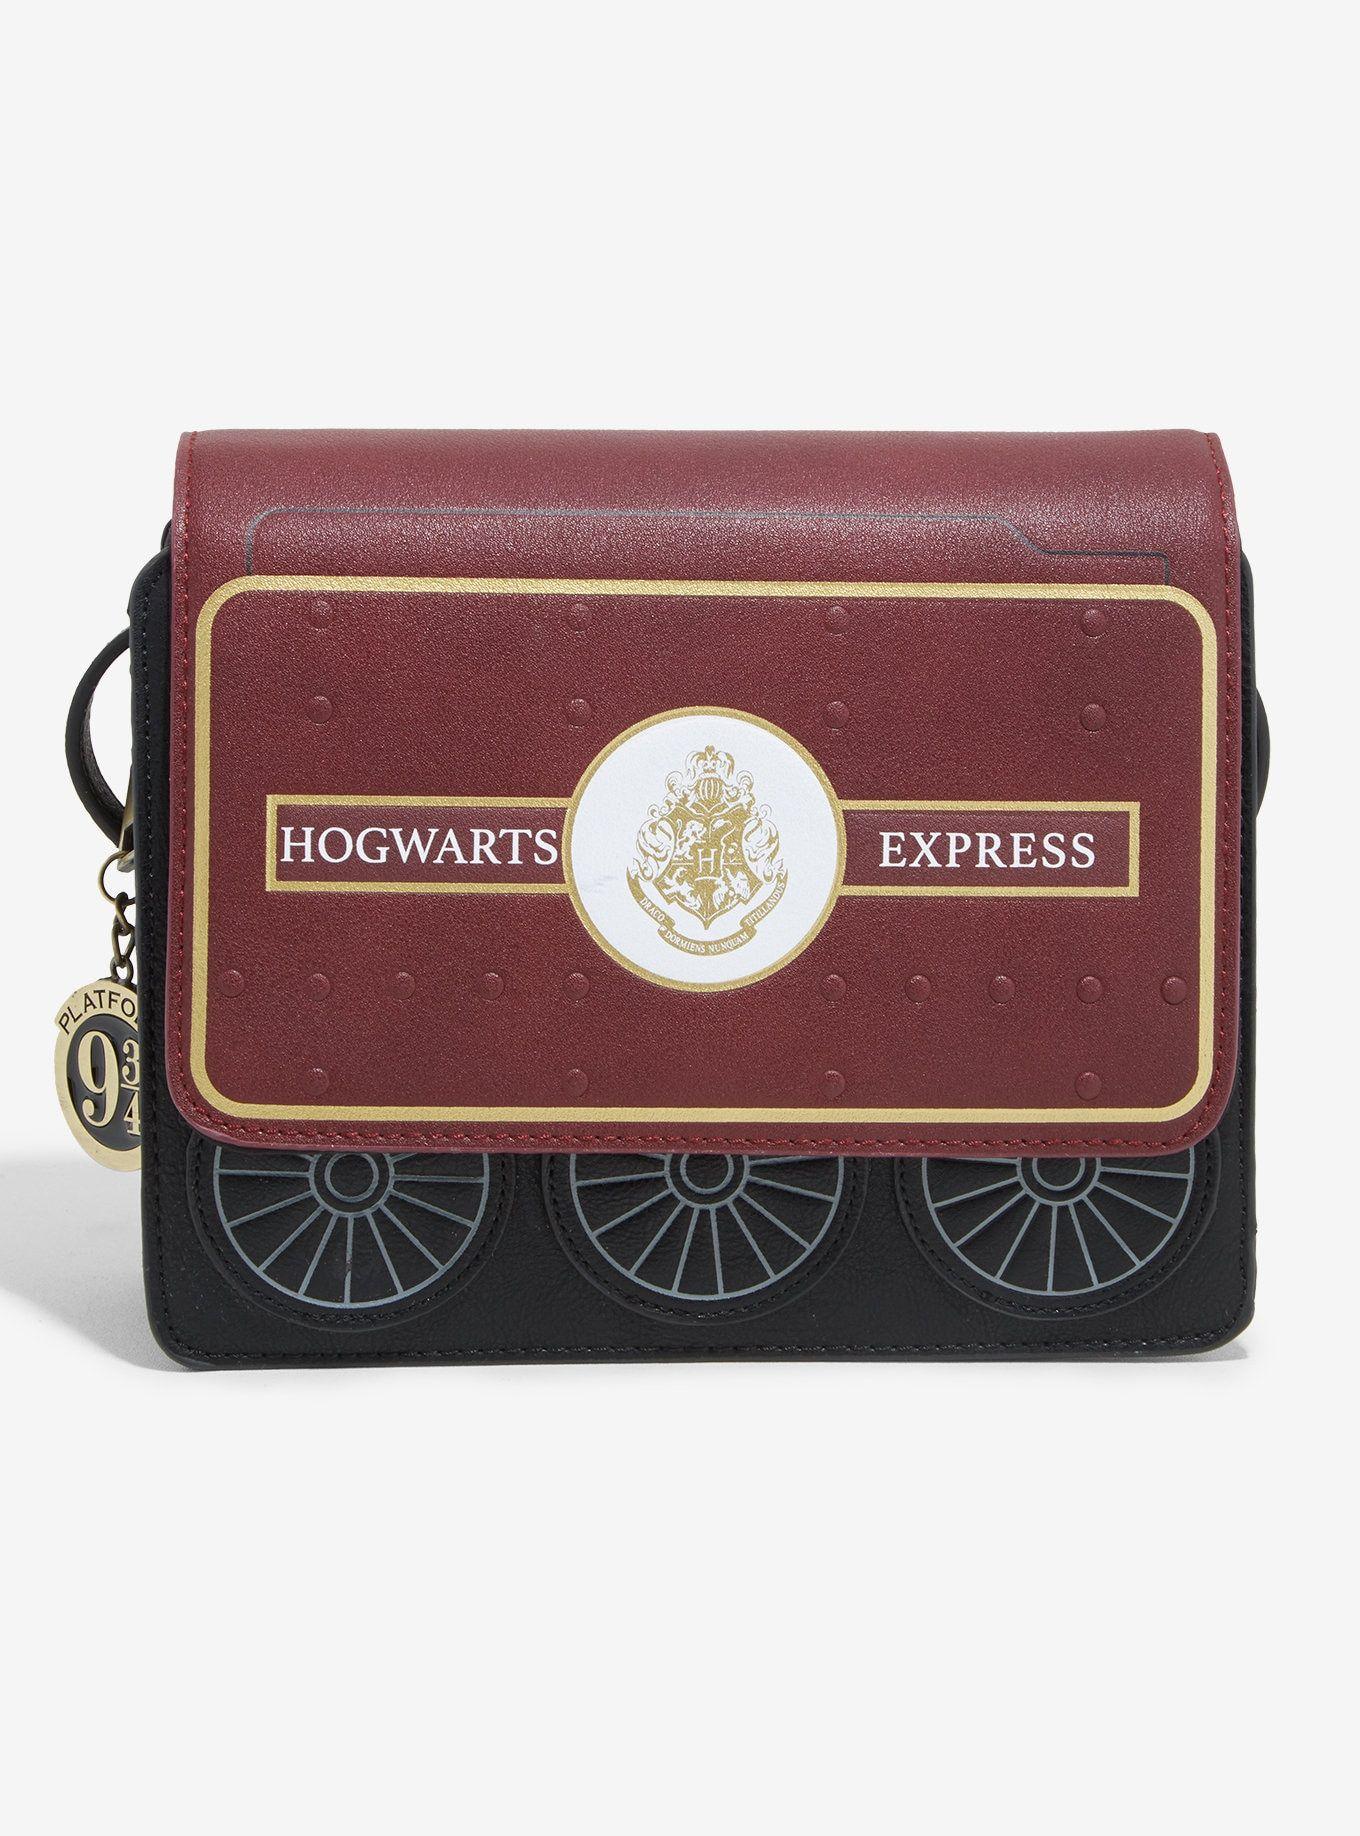 Harry Potter Hogwarts Express Crossbody Bag Hogwarts